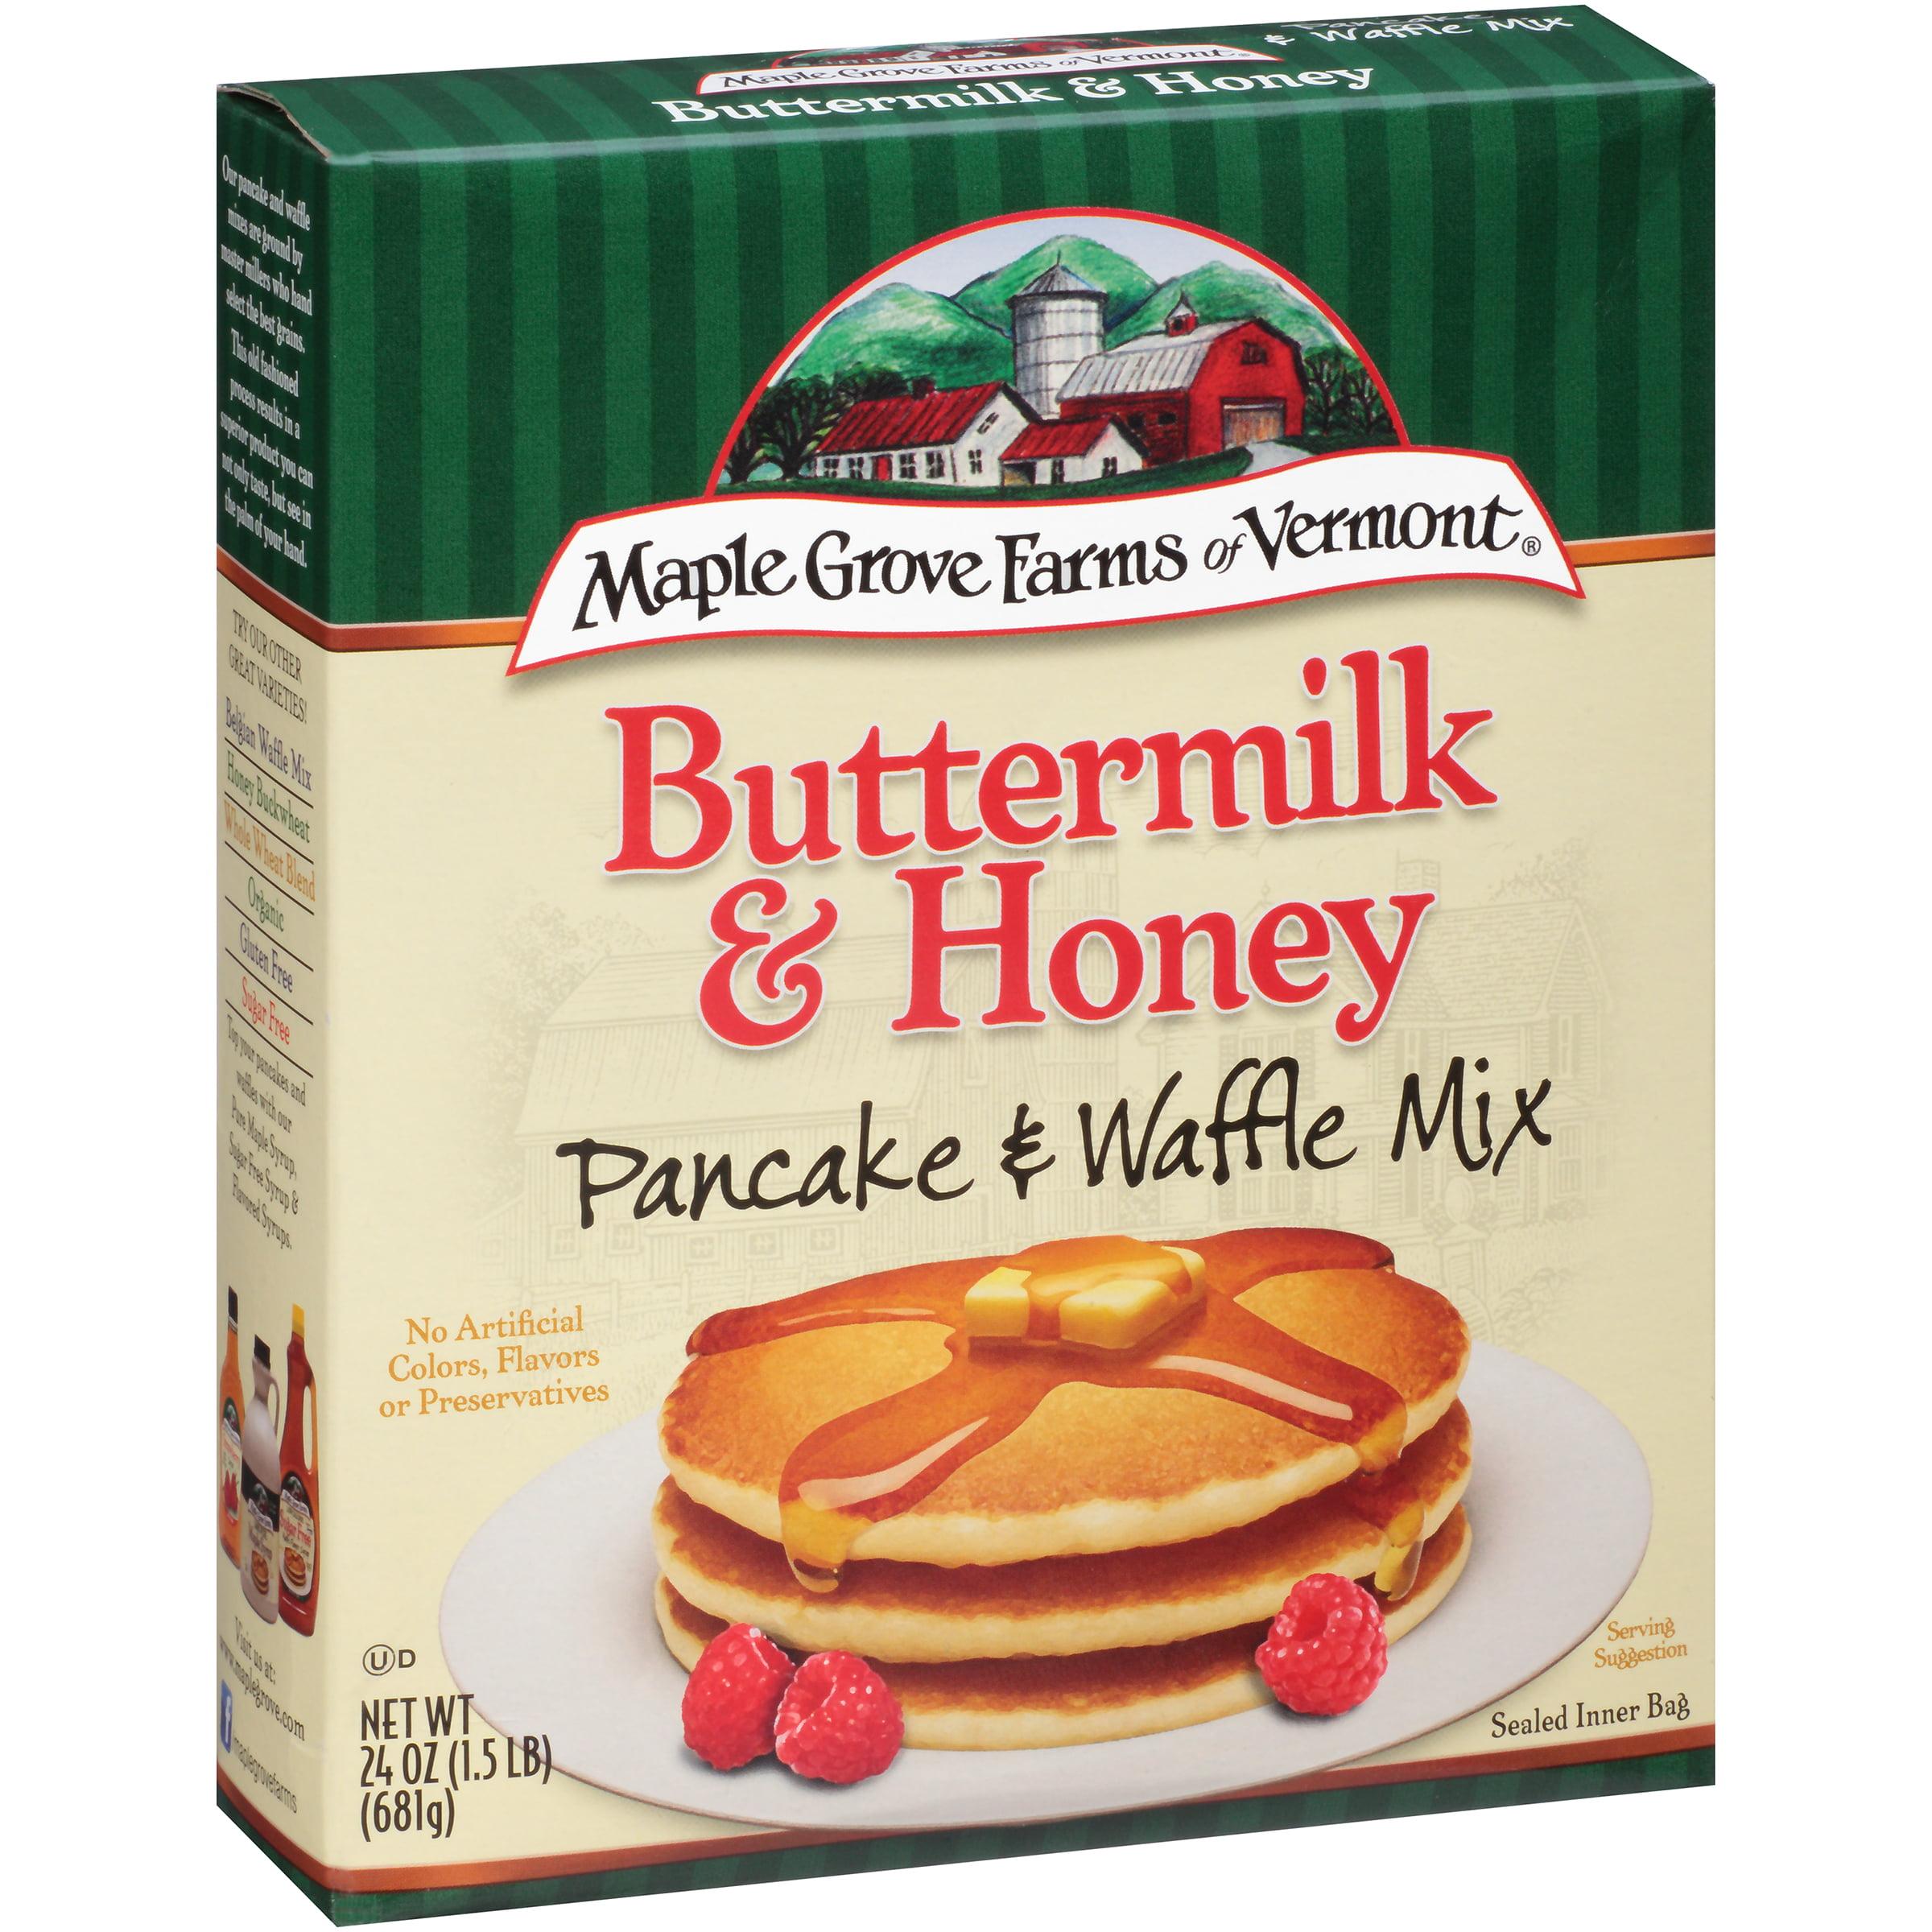 Maple Grove Farms Pancake & Waffle Mix, Honey Buckwheat, 24 Oz by Maple Grove Farms